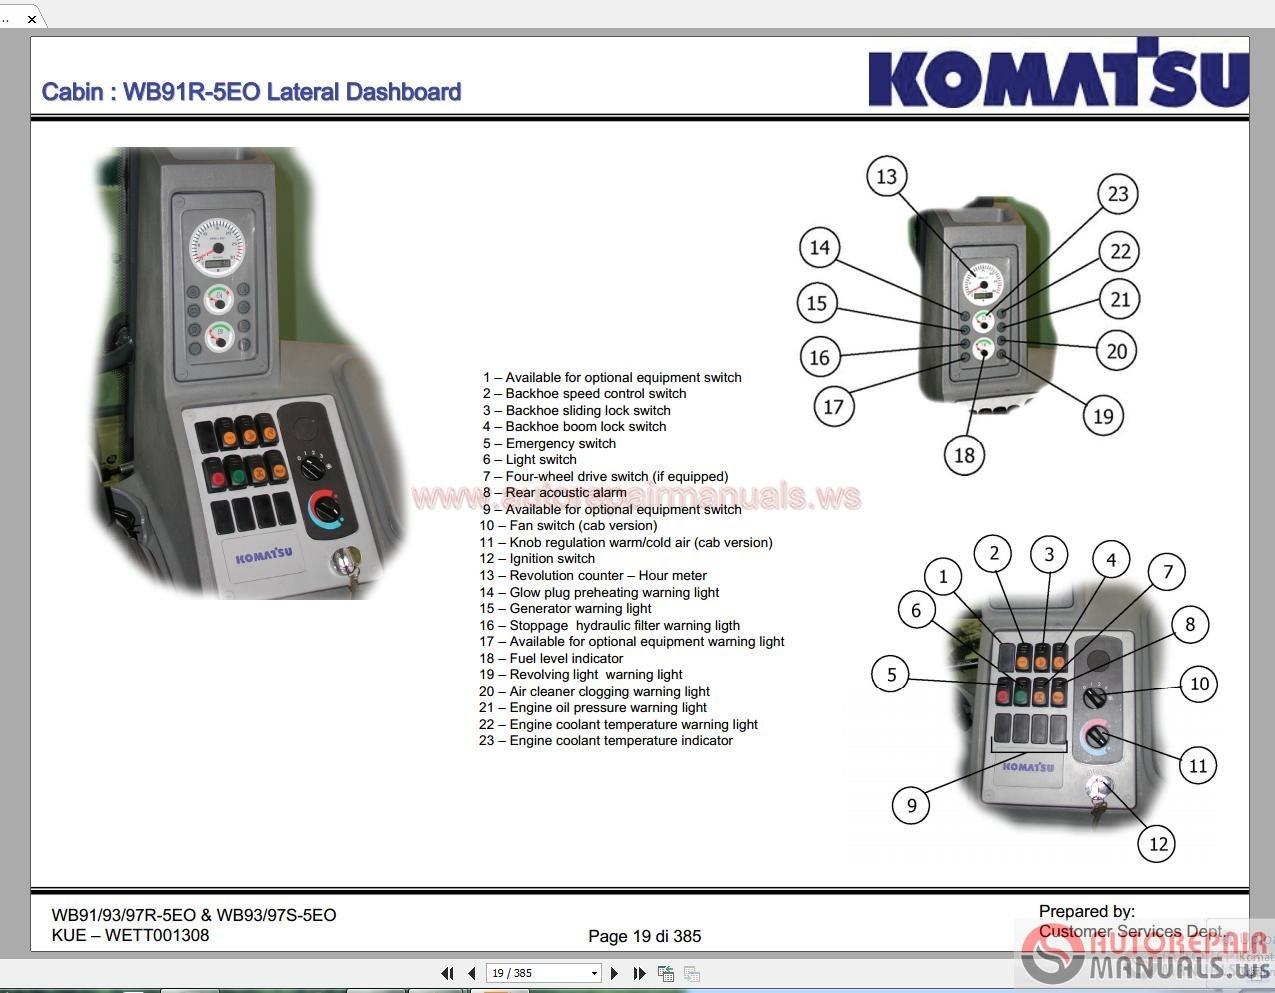 Komatsu Wb91 93 97r 5eo Amp Wb93 97s 5e0 Service Training